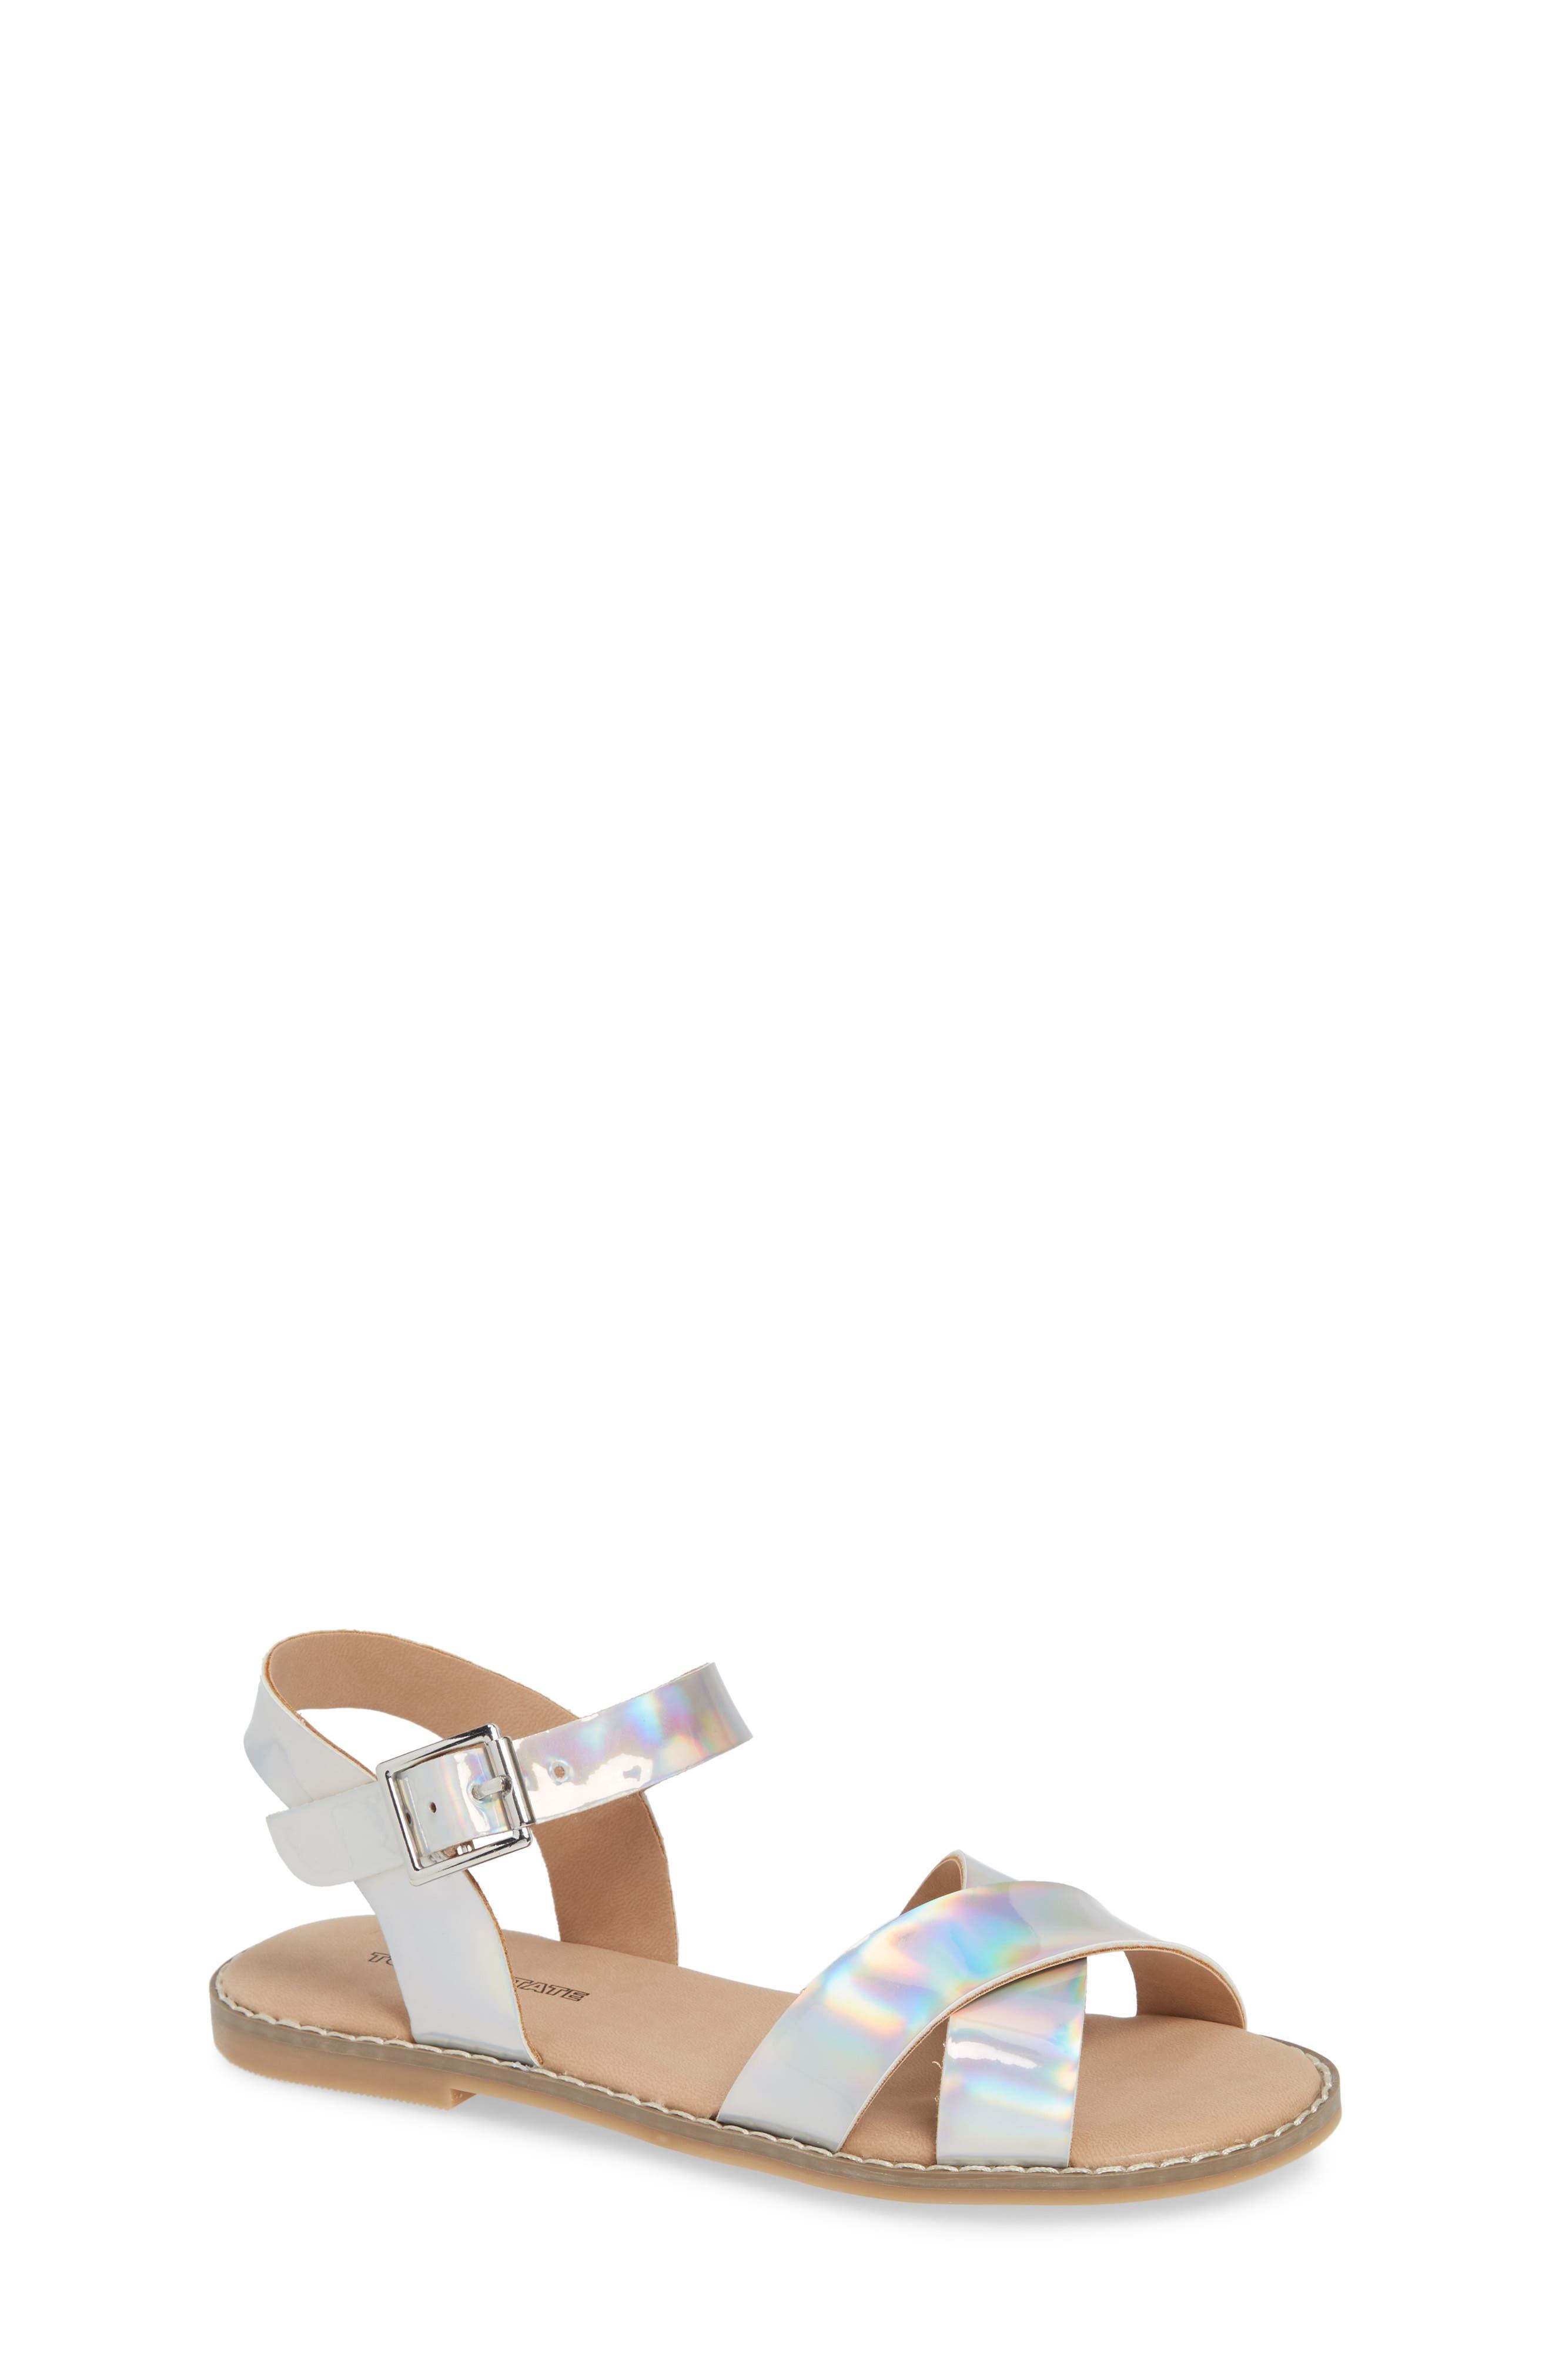 TUCKER + TATE Arya Cross Strap Sandal, Main, color, SILVER HOLOGRAM FAUX LEATHER